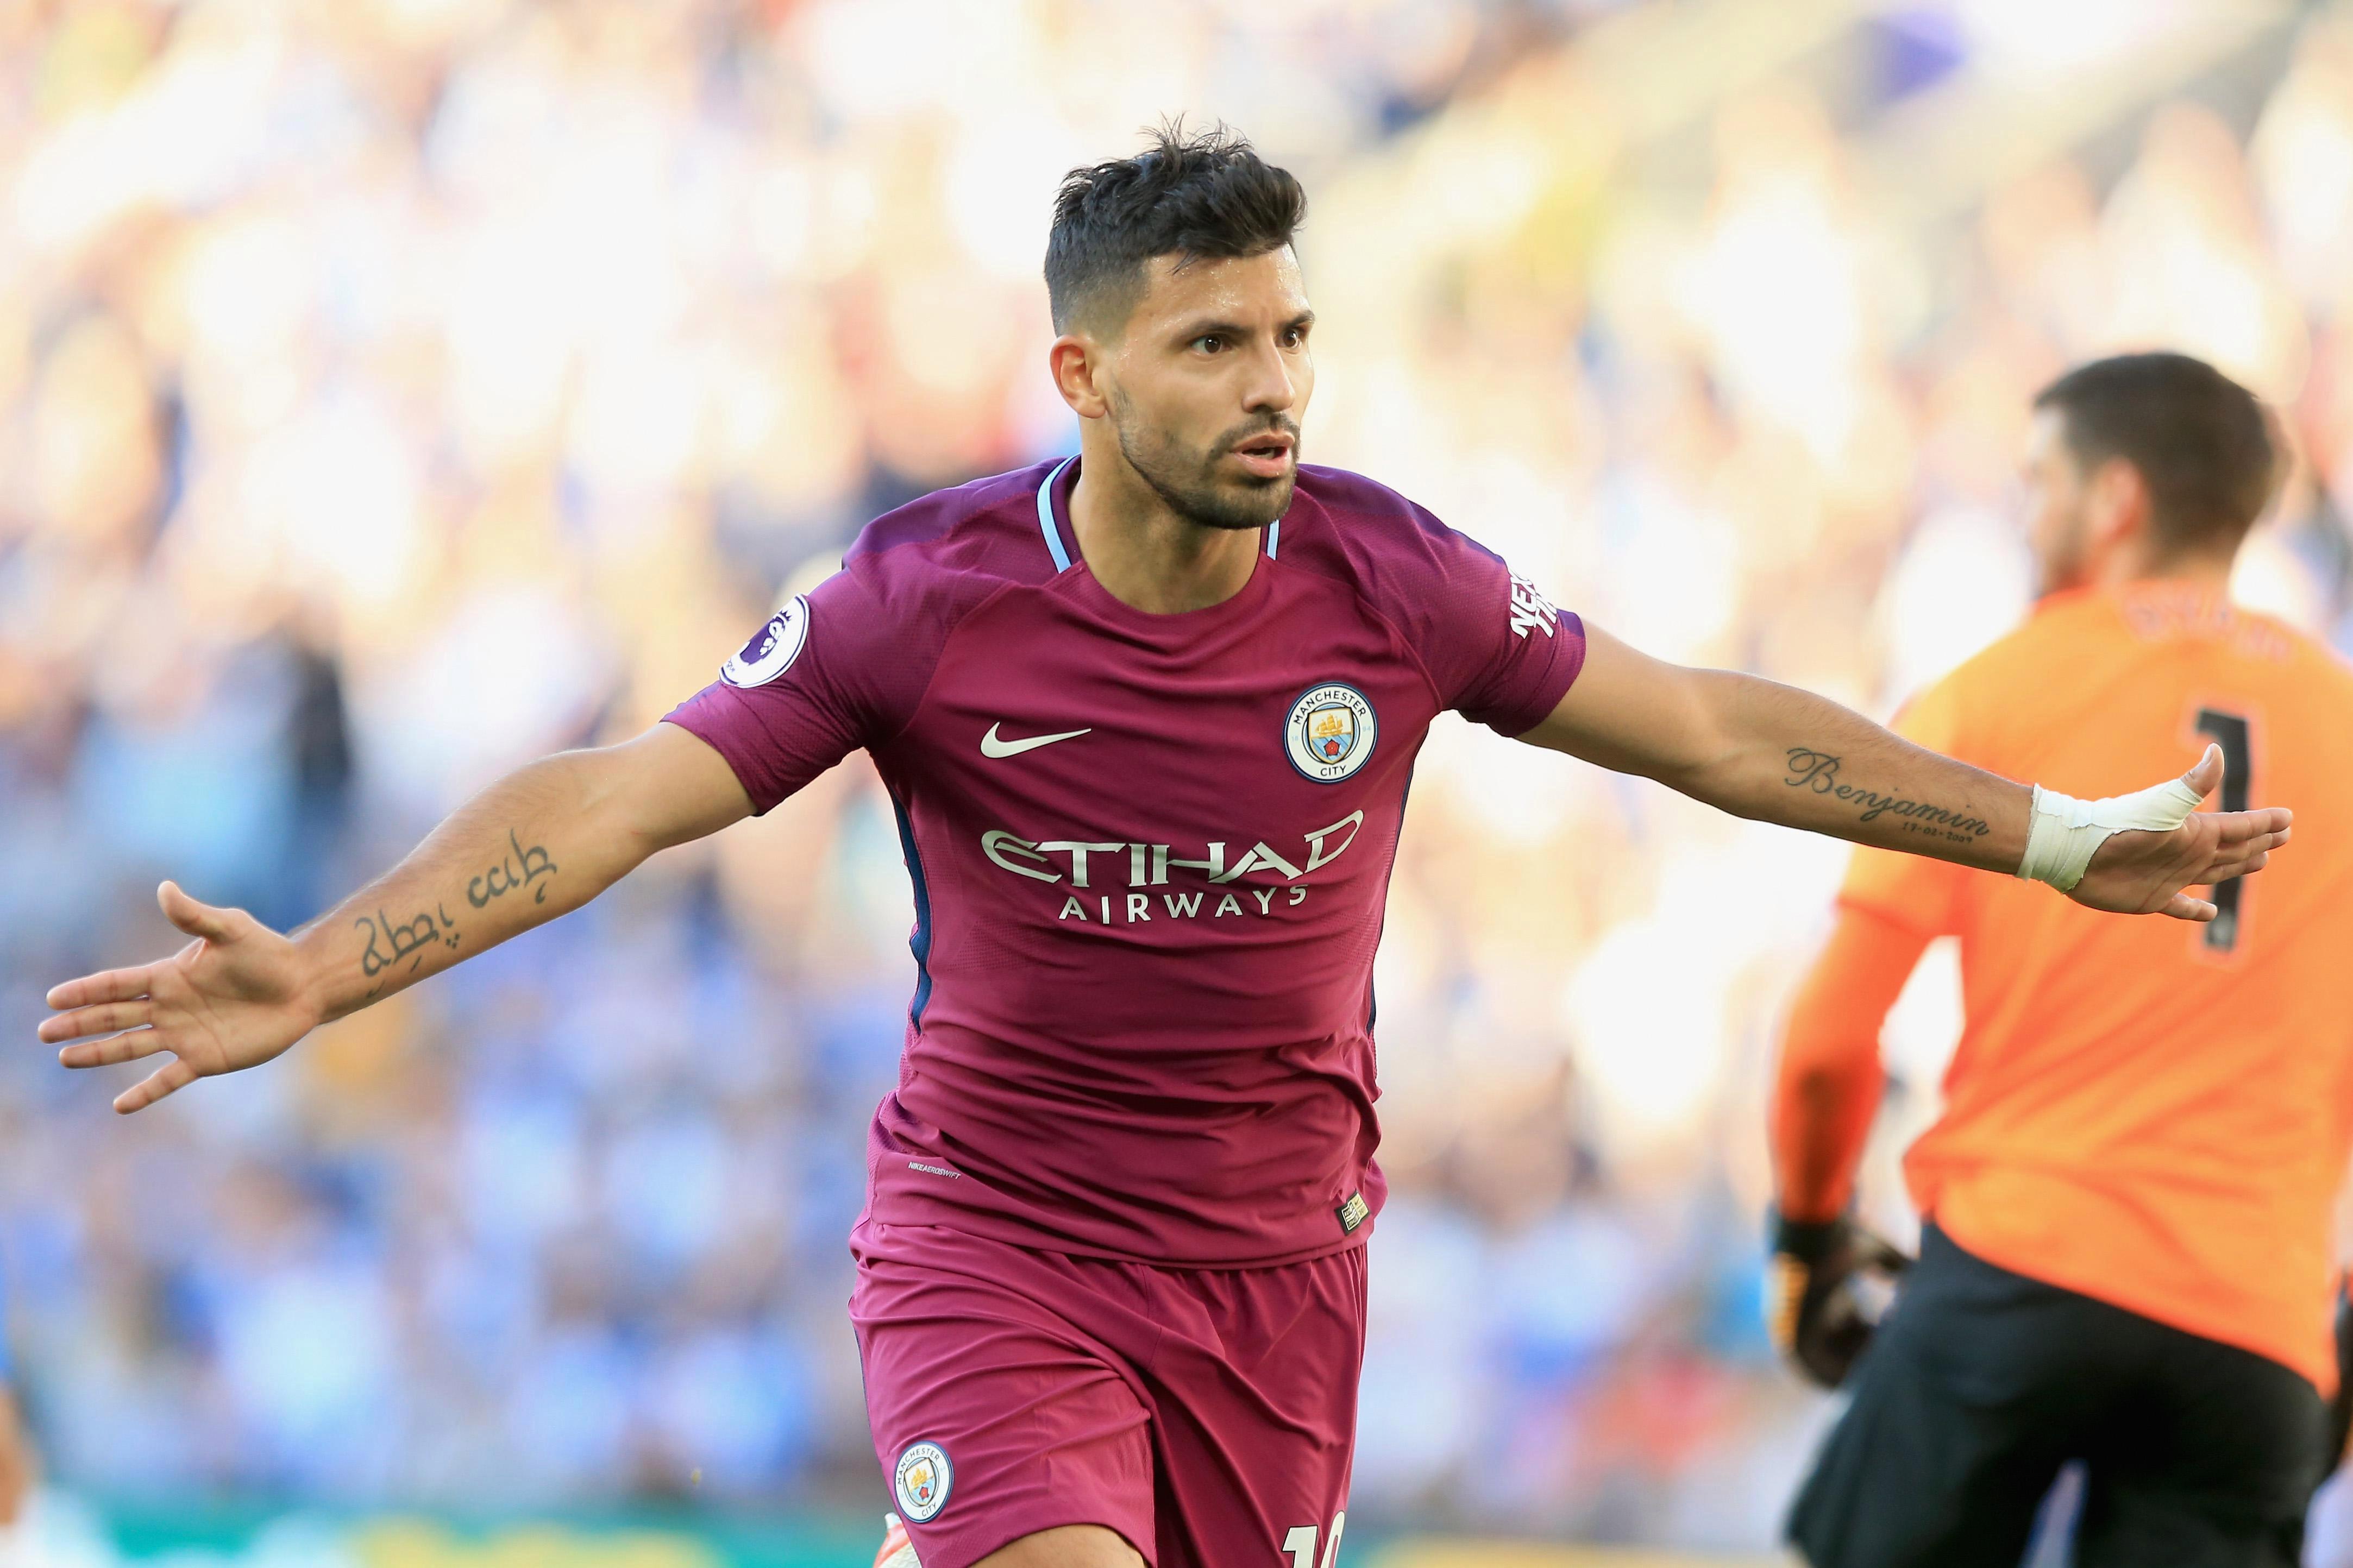 Sergio Aguero scored as Man City beat Brighton 2-0